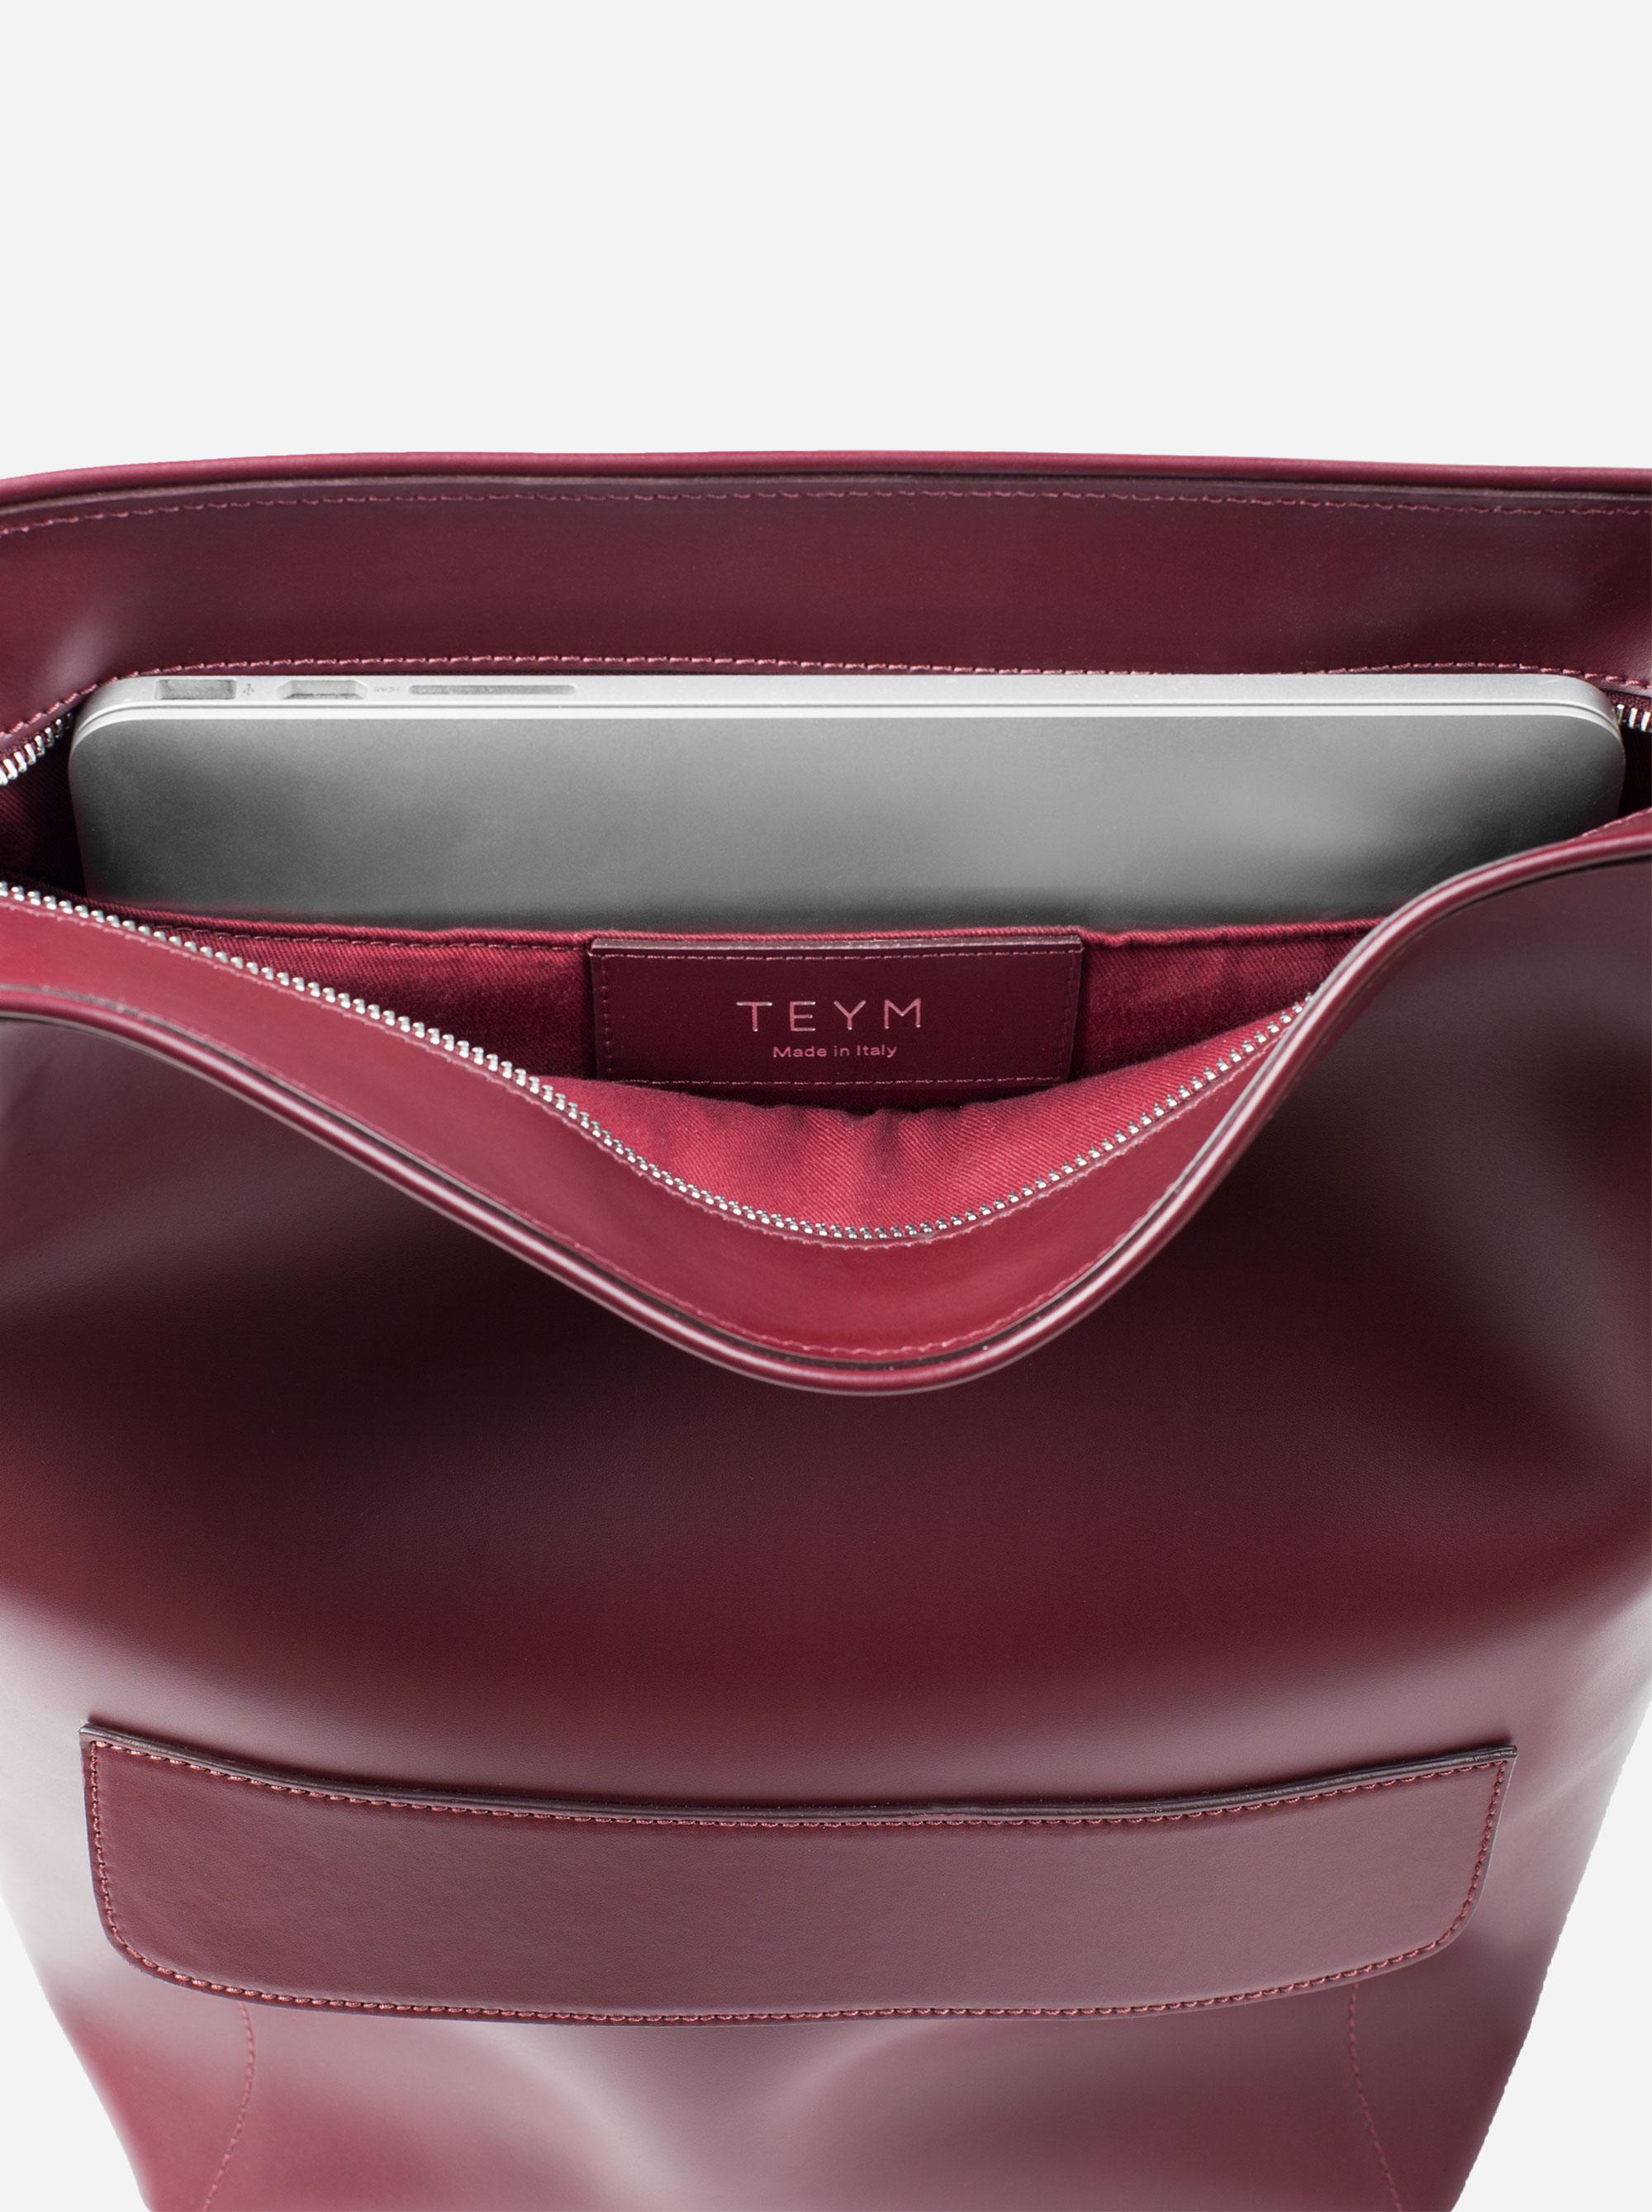 Teym - The Shoulder Bag - Burgundy - 2